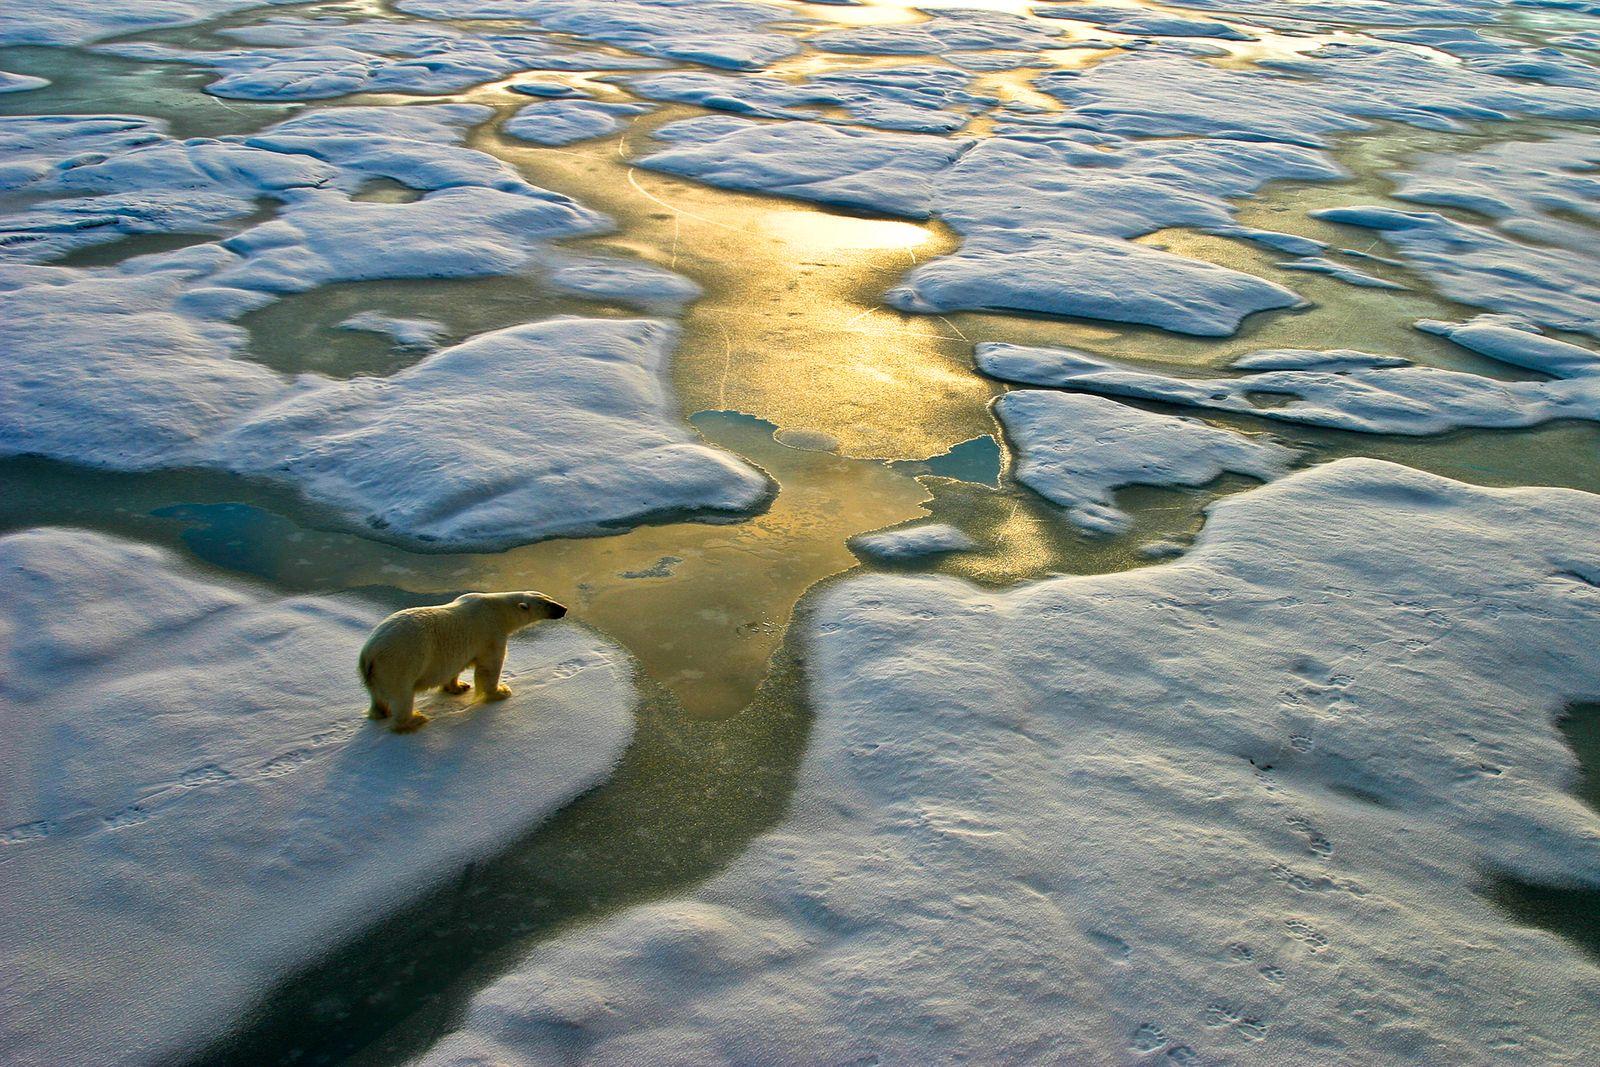 Polar bear on ice close to golden glittering water